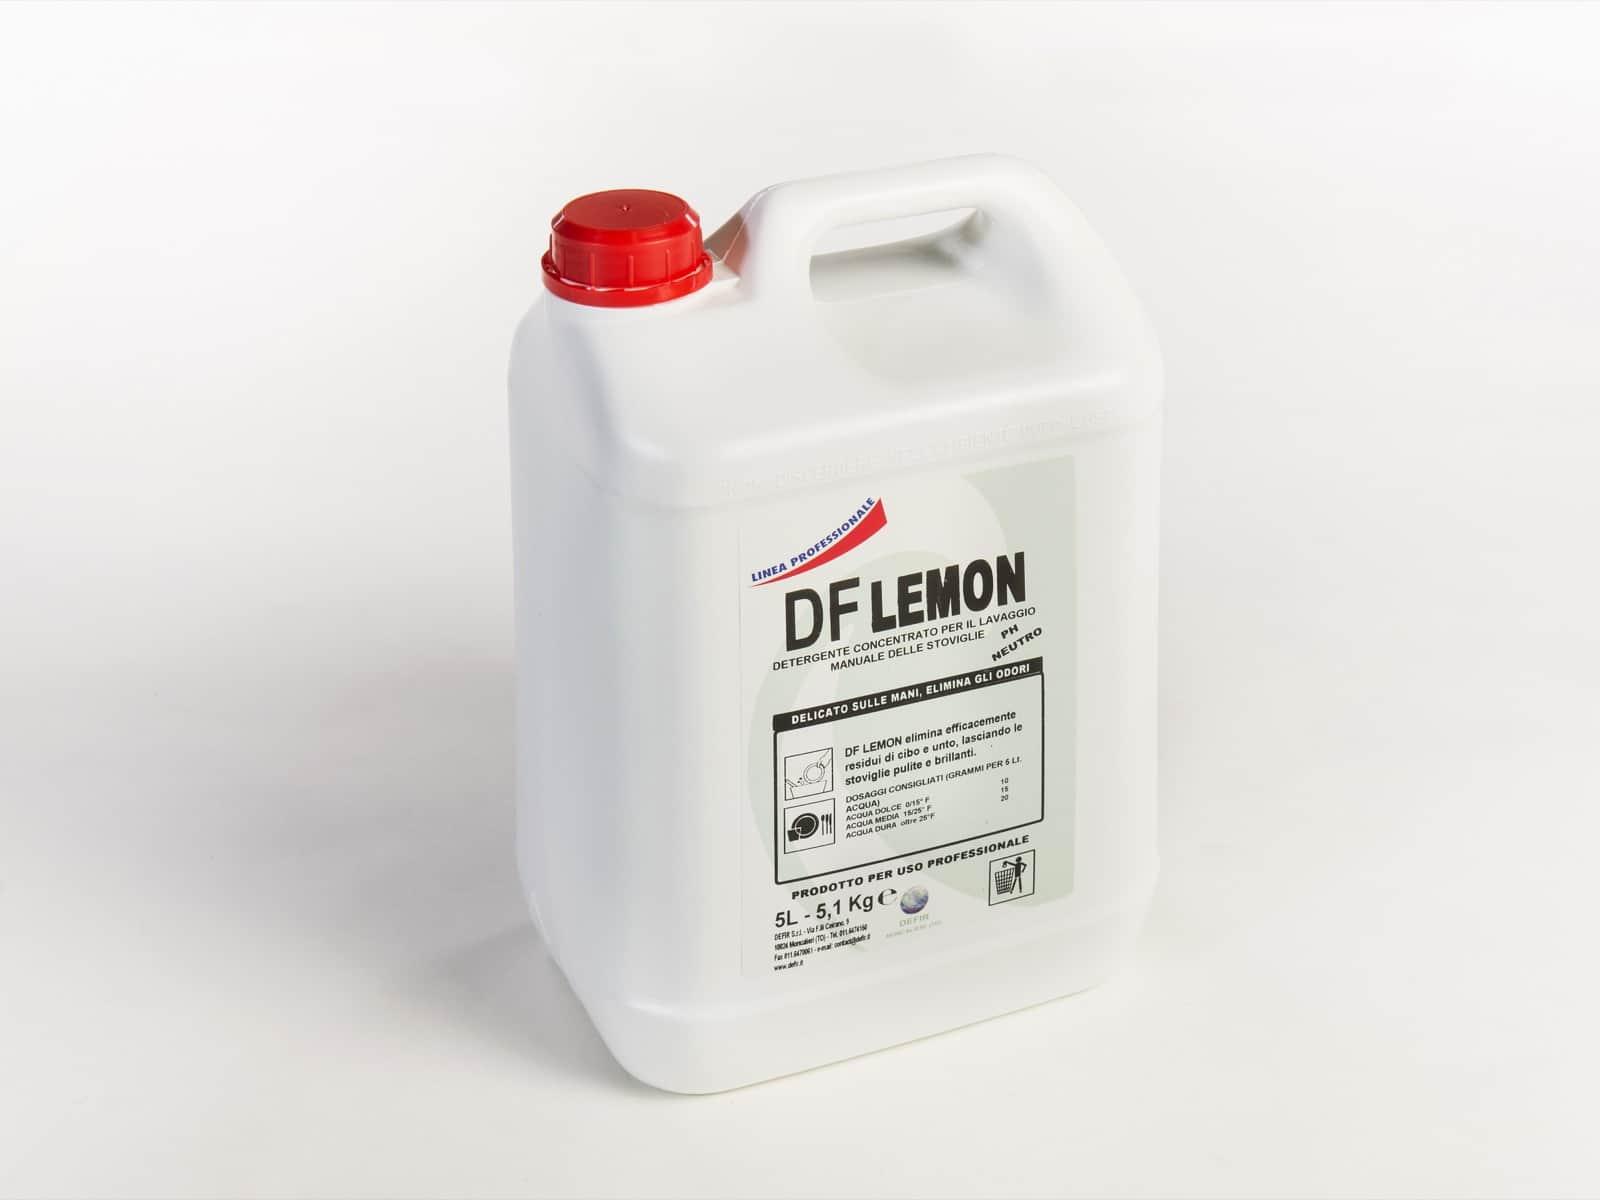 DF Lemon detersivo concentrato sgrassante stoviglie 5L - Defir detergenti Moncalieri Torino